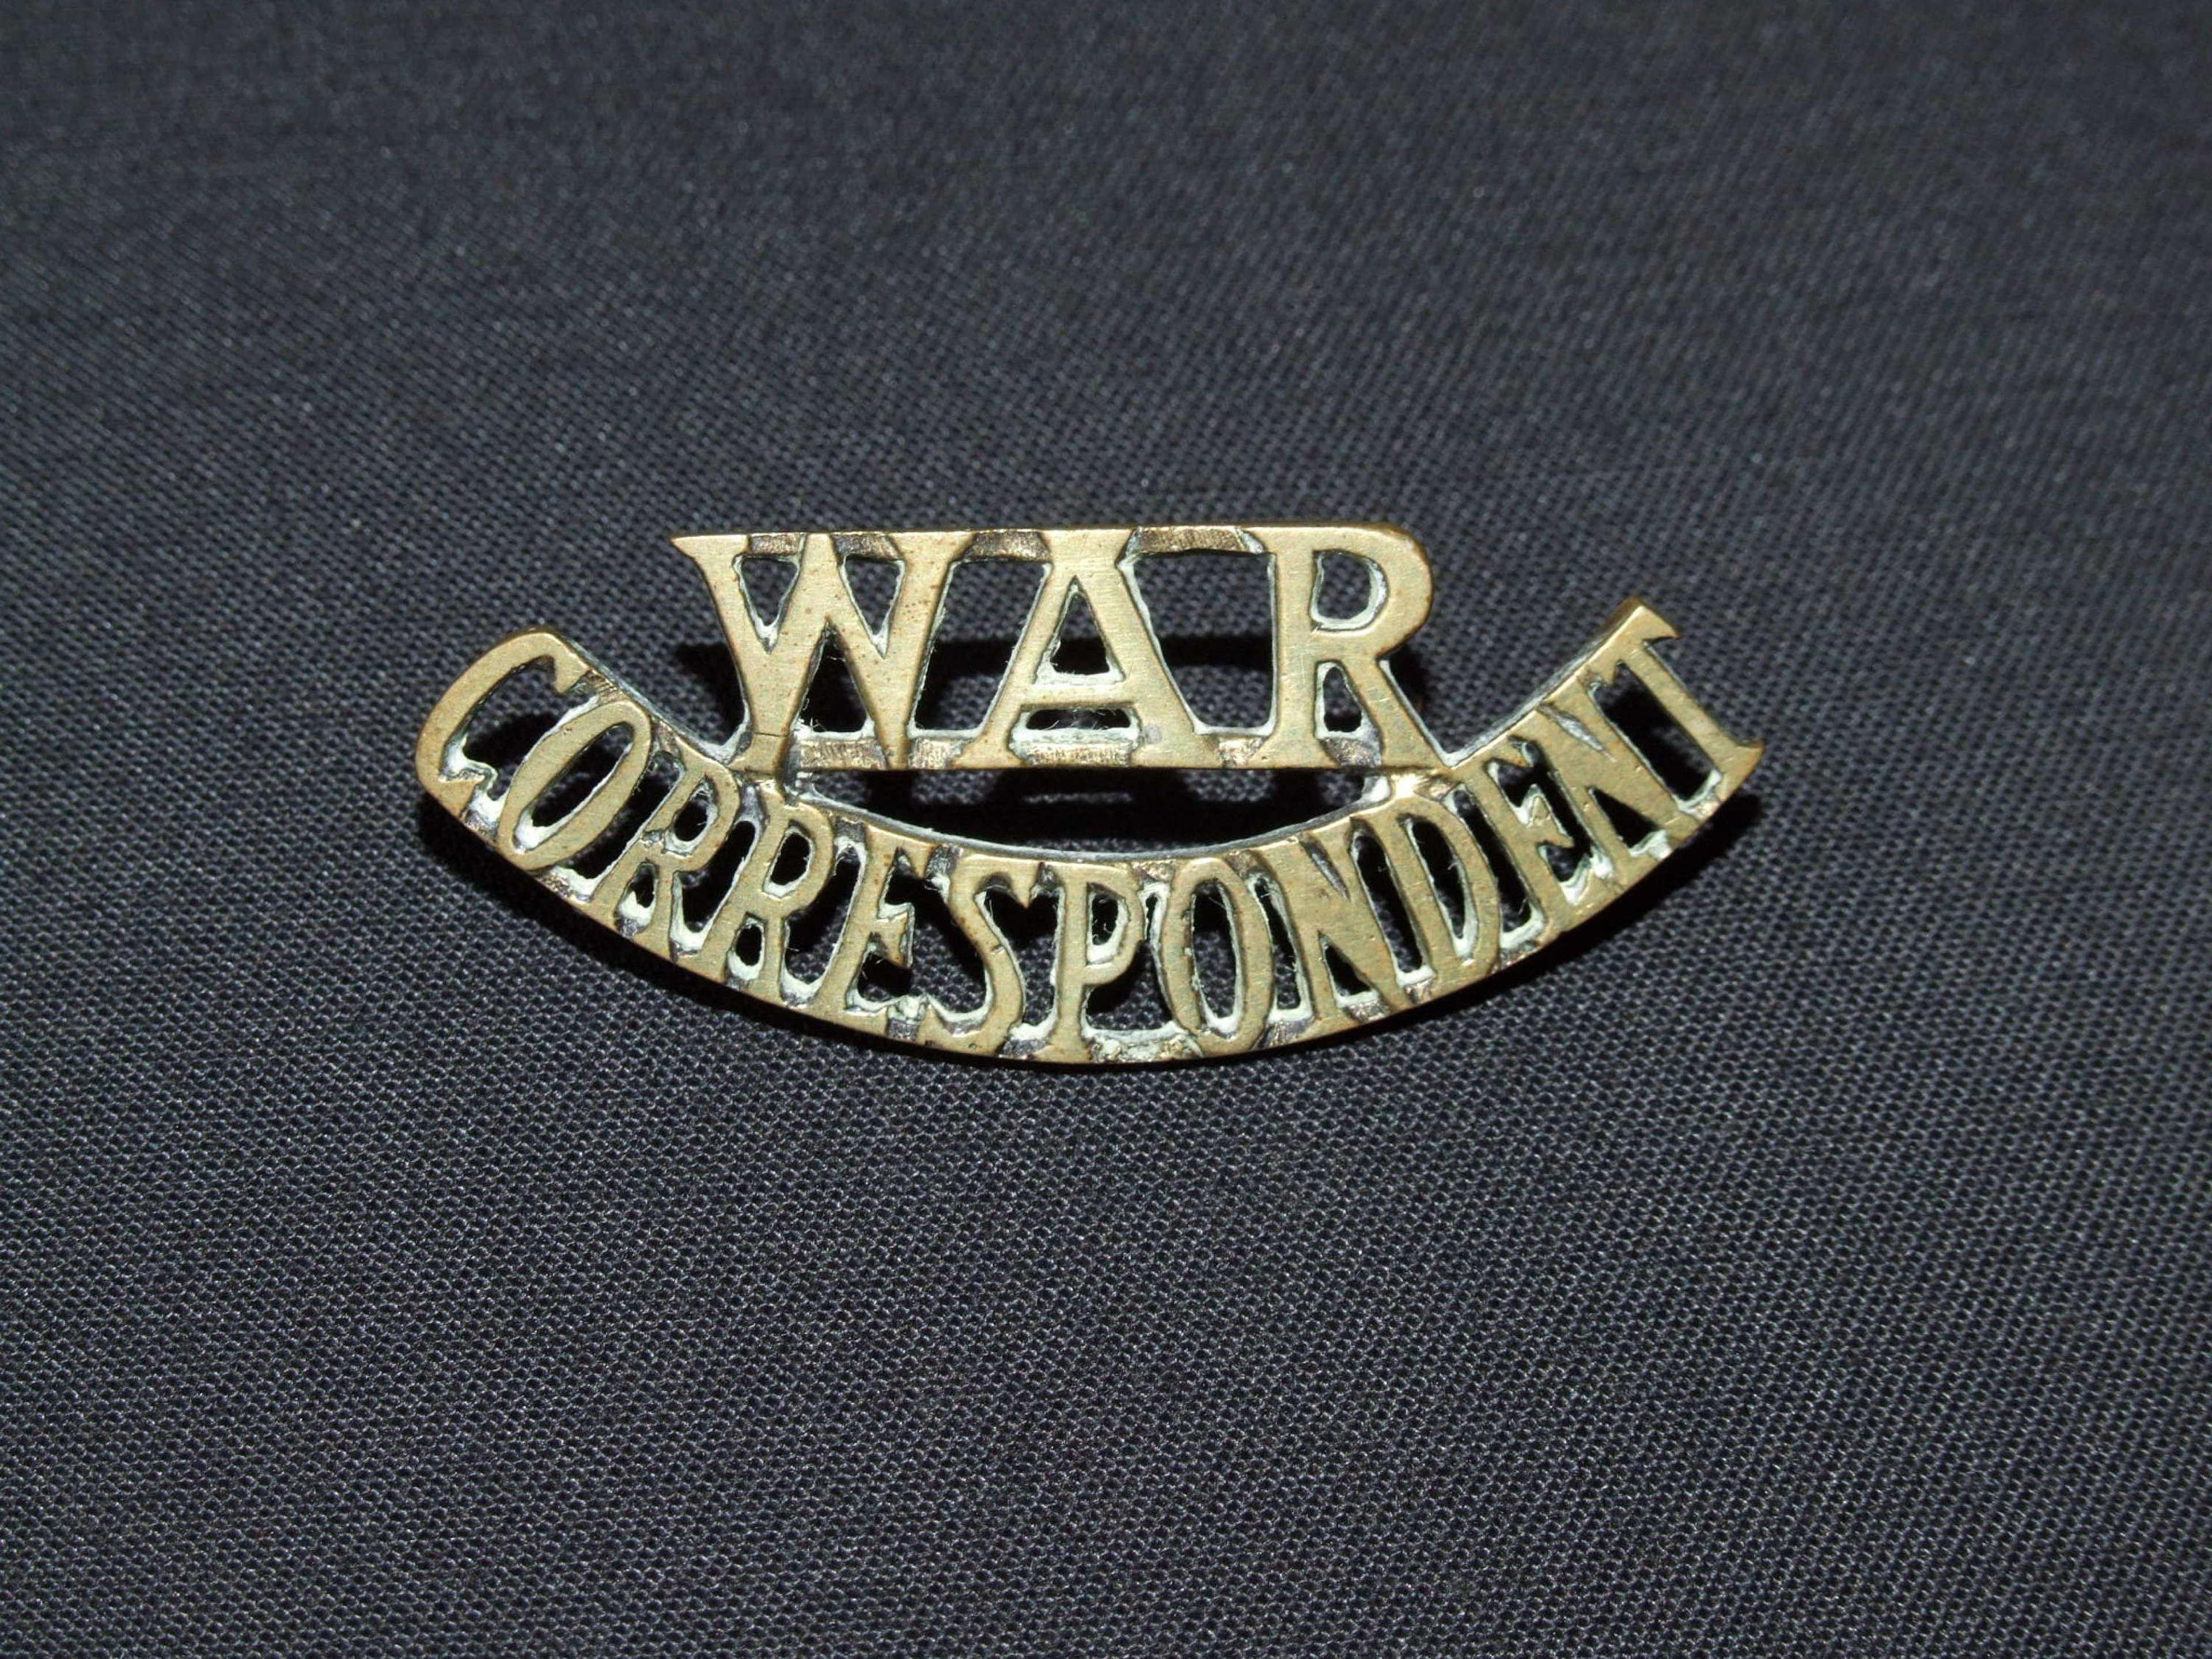 War Correspondent Shoulder Title